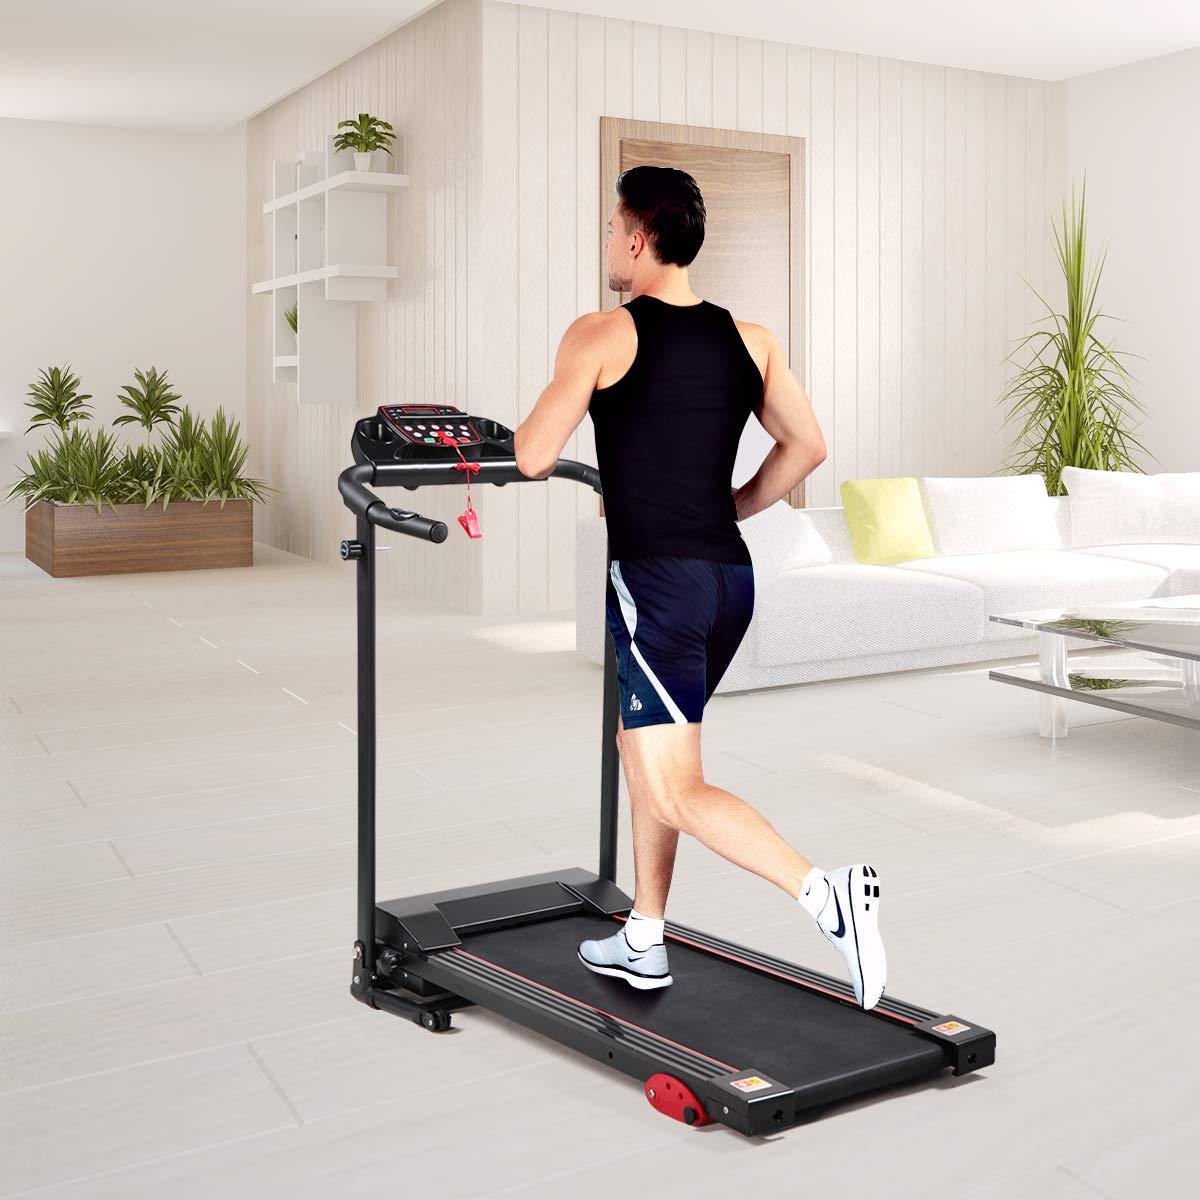 Thegreatshopman Folding Electric Treadmill Power Motorized Running Machine for Home Gym Exercise Walking Fitness